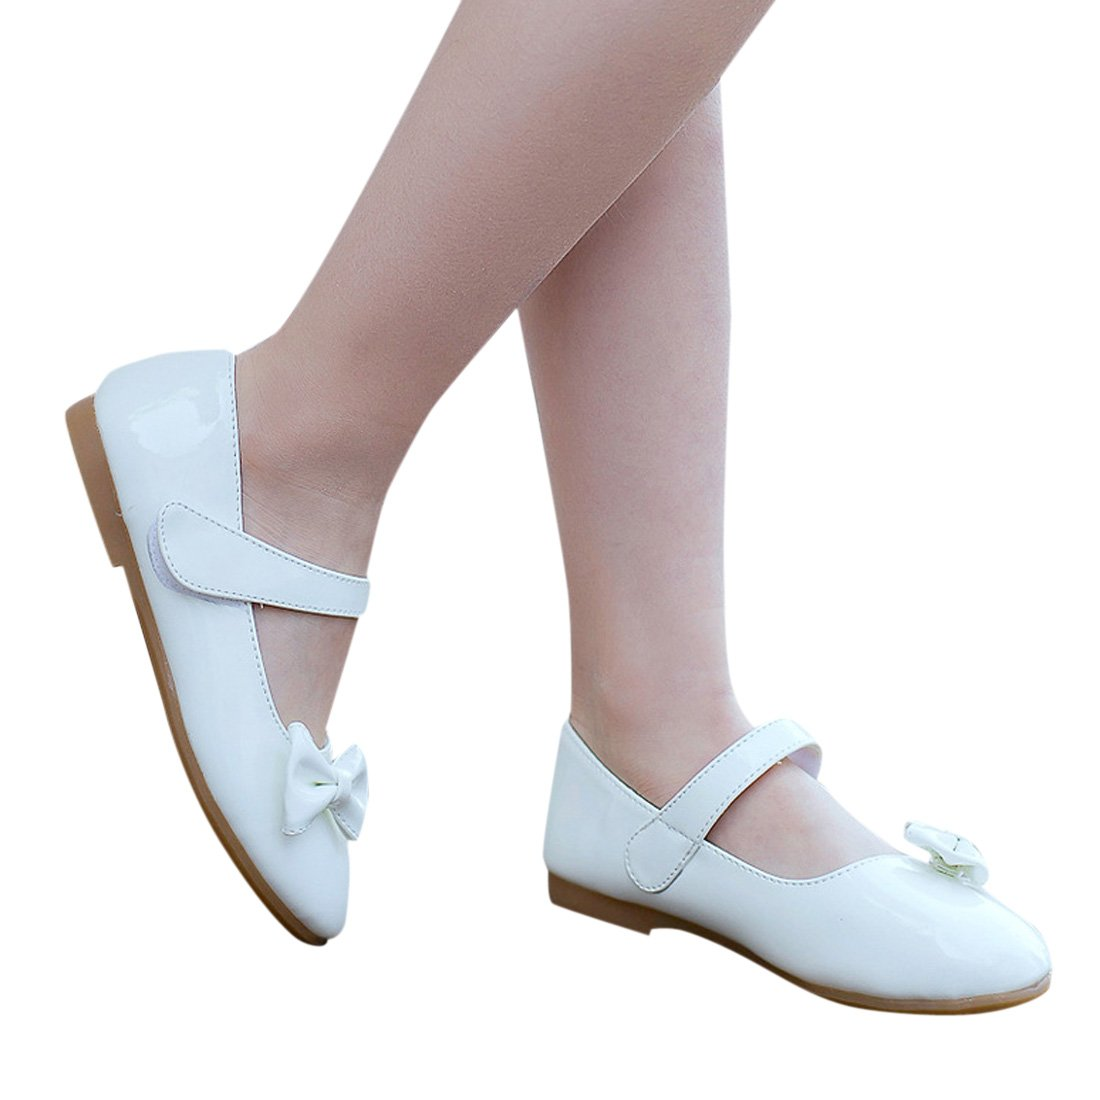 Toddler//Little Kid Lopetve Girls Sweet Bowknot Mary Janes School Wearing Princess Shoes